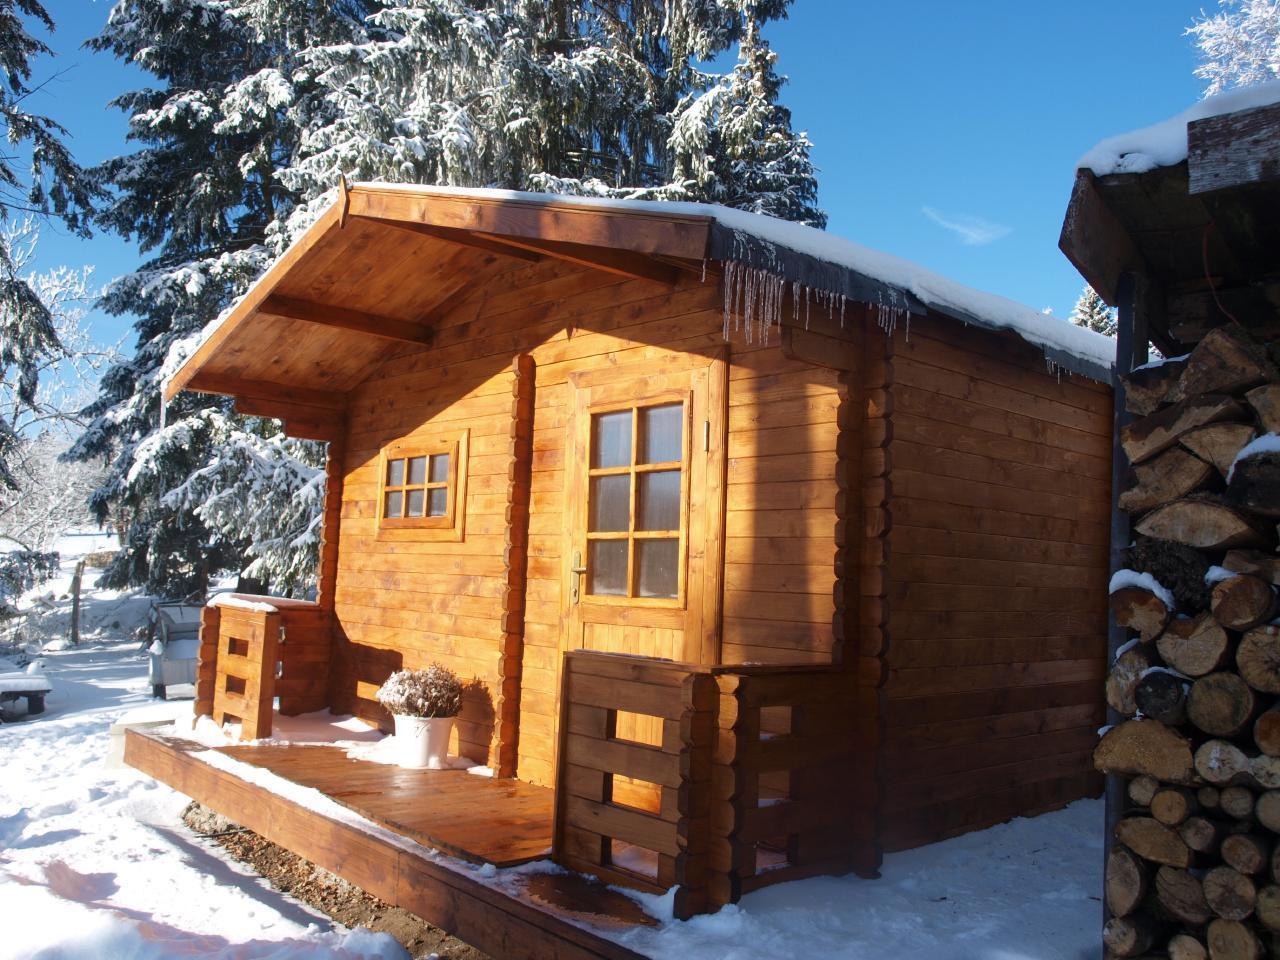 Ferienhaus Steinhäuschen Shila, im Naturparc der Vogesen,  mit Saunahaus (1717460), La Rosière, Haute-Saône, Franche-Comté, Frankreich, Bild 32